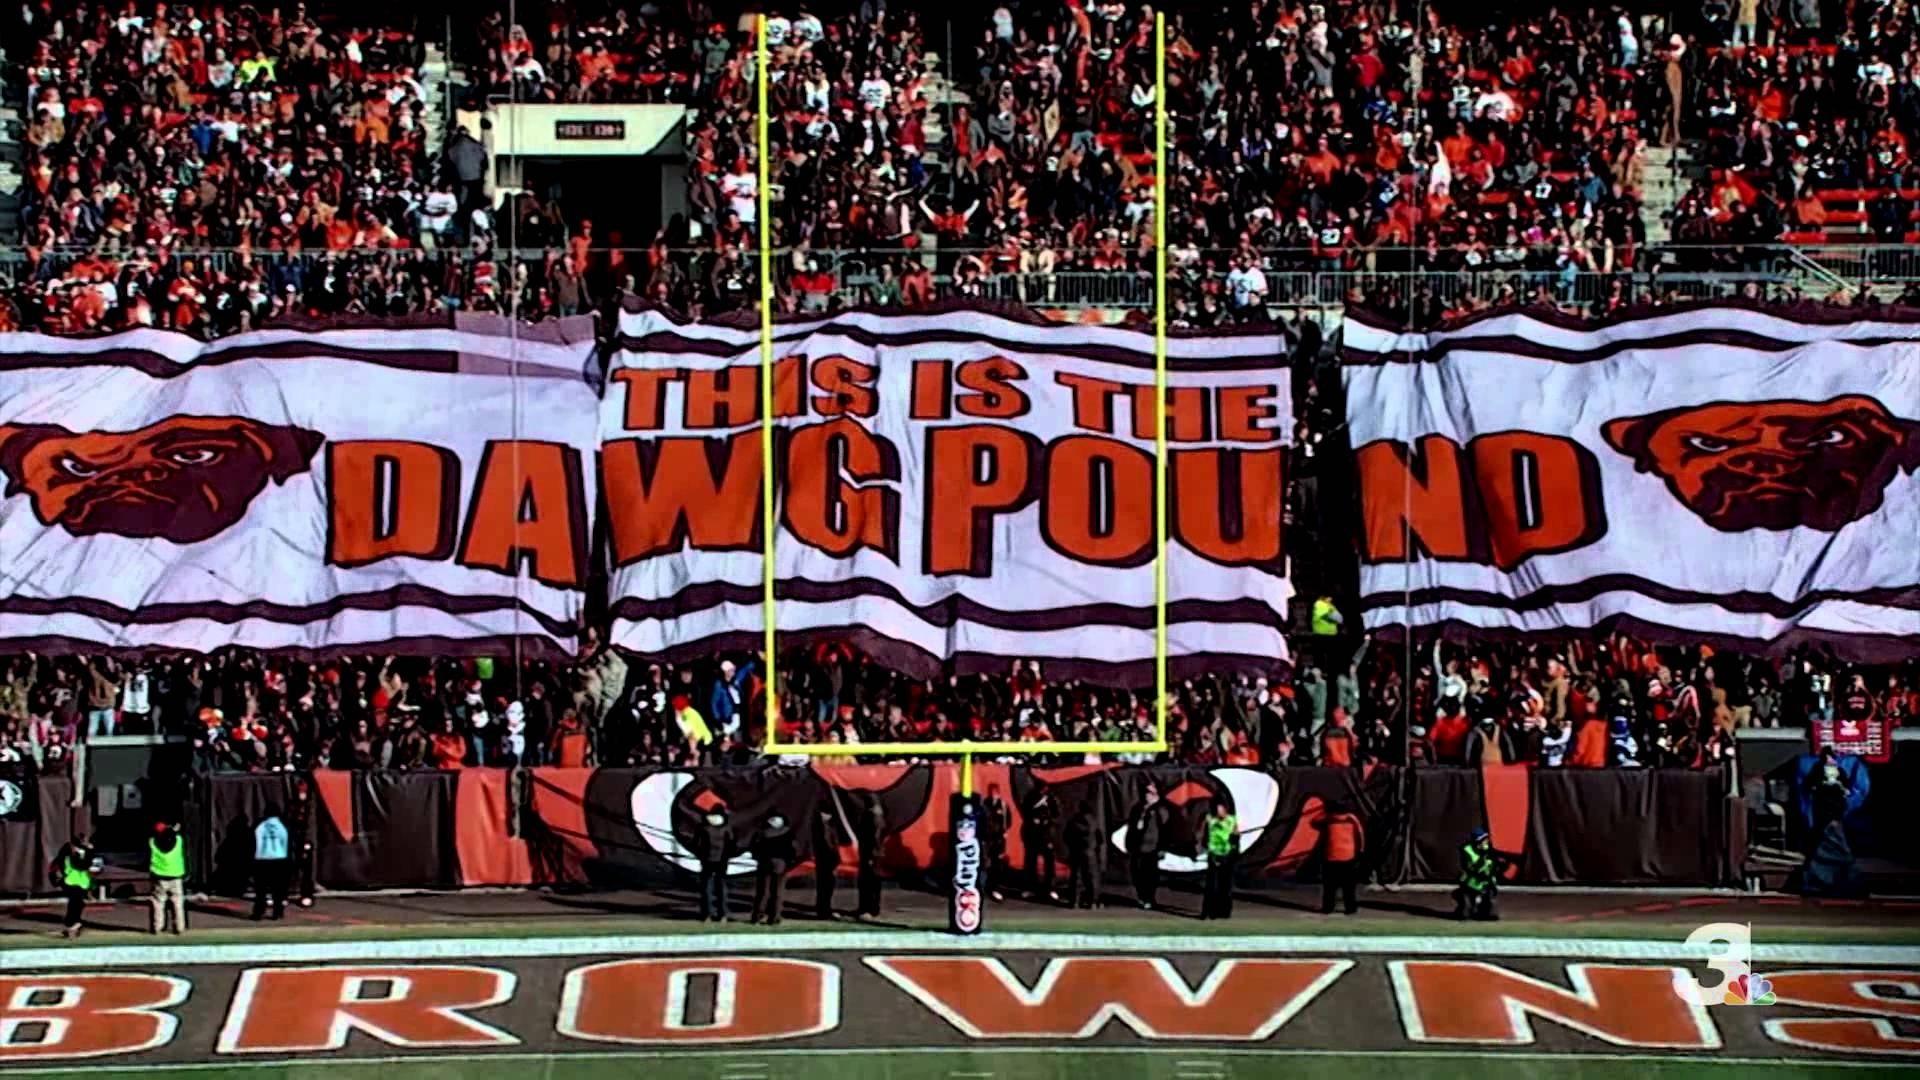 Cleveland Browns Player Wallpaper Desktop –  https://wallucky.com/cleveland-browns-player-wallpaper-desktop/   Wallpapers  and Backgrounds HD   Pinterest …